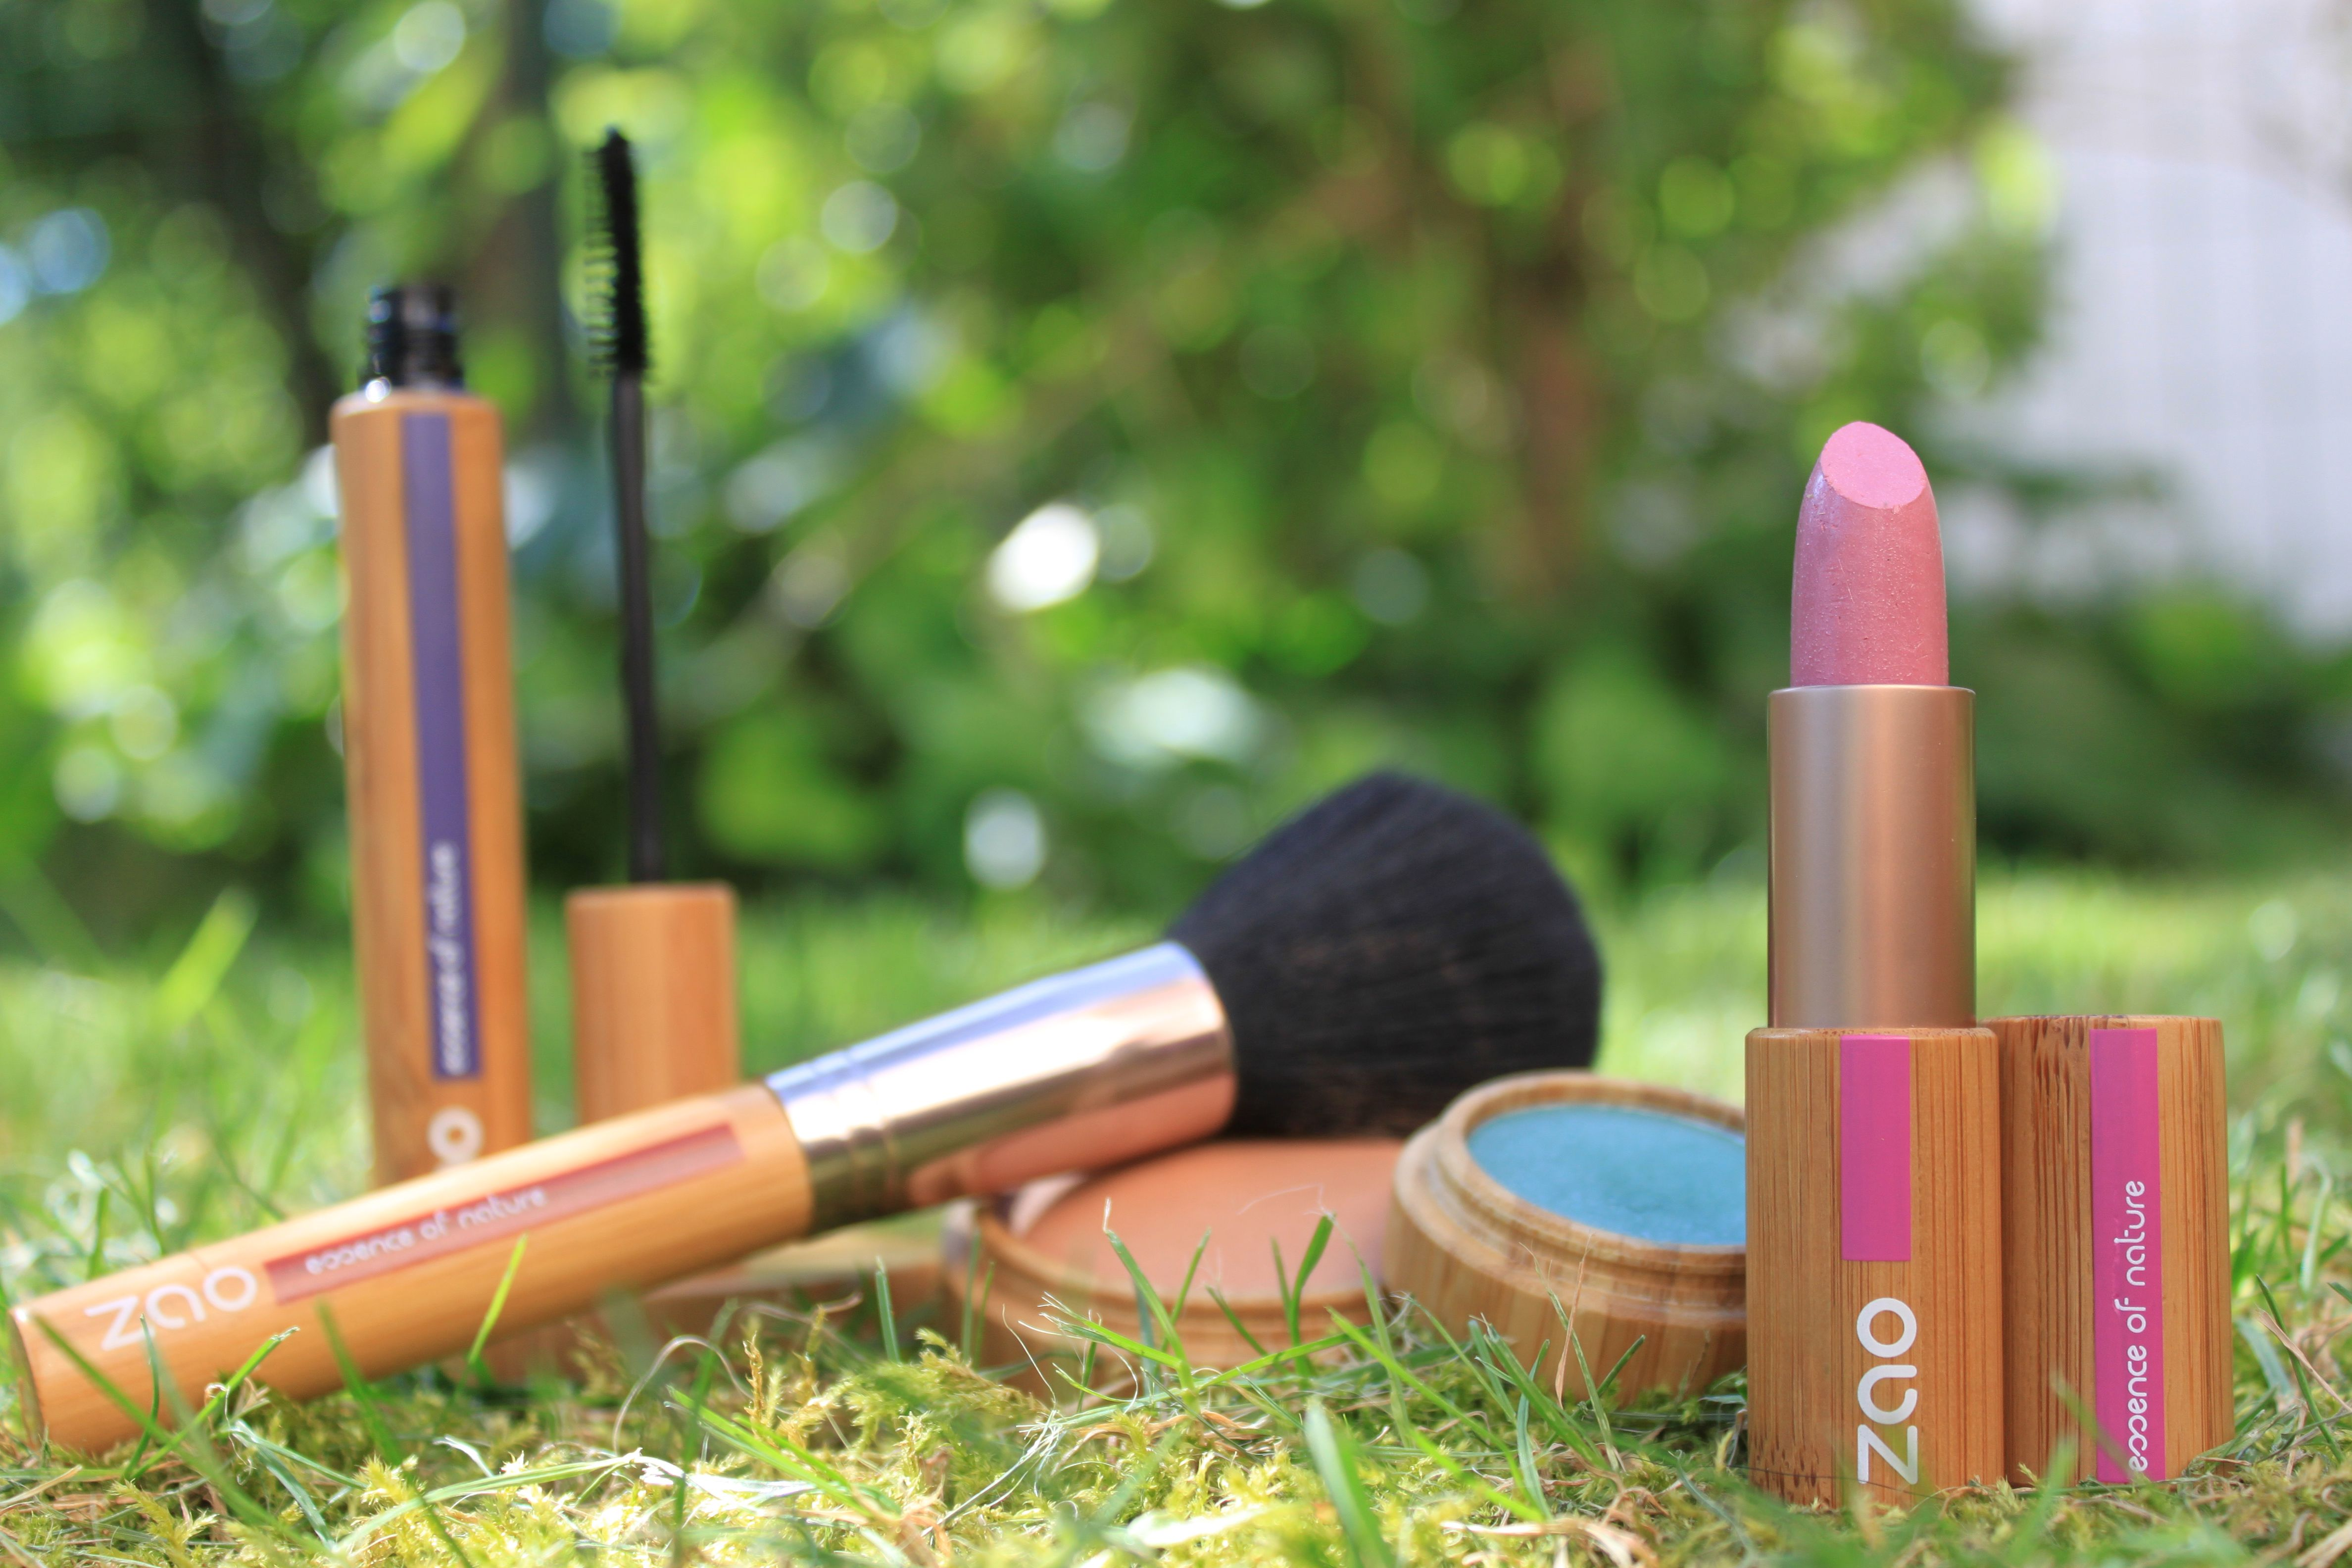 Zao Makeup Maquillage Bio Organic Makeup Maquillage